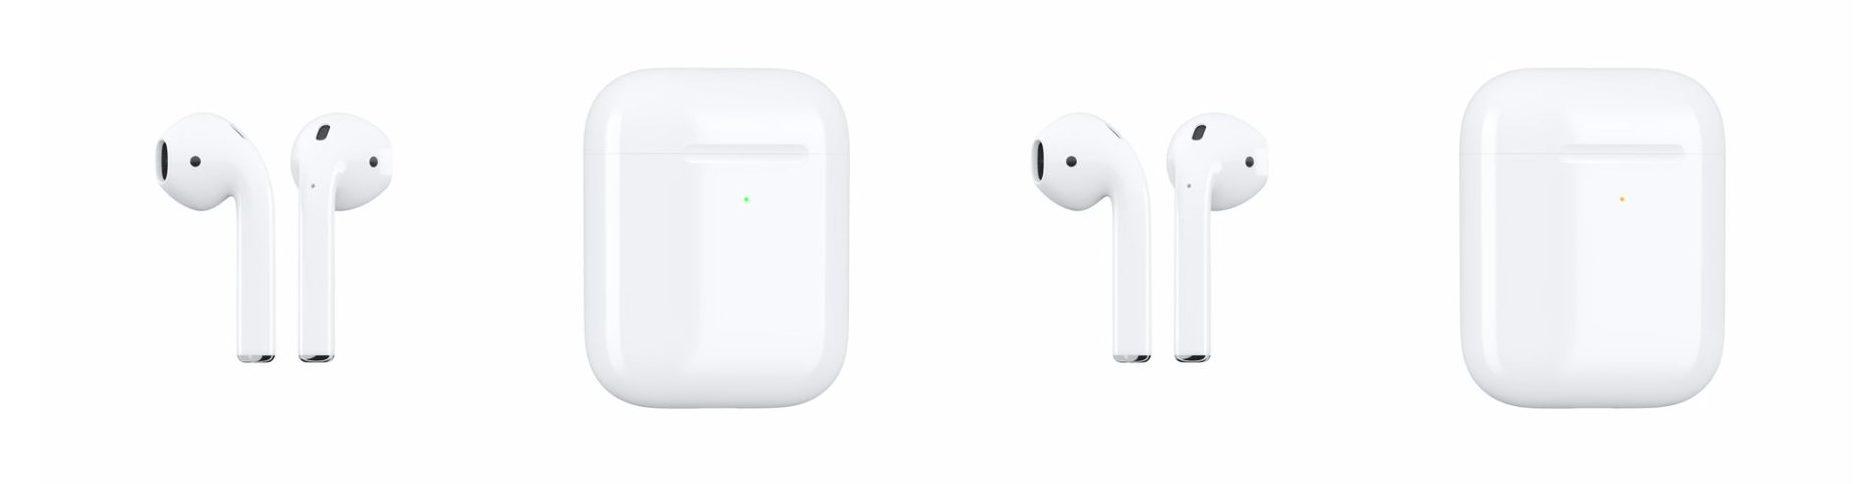 La quinta beta iOS 12 nasconde la nuova custodia AirPods